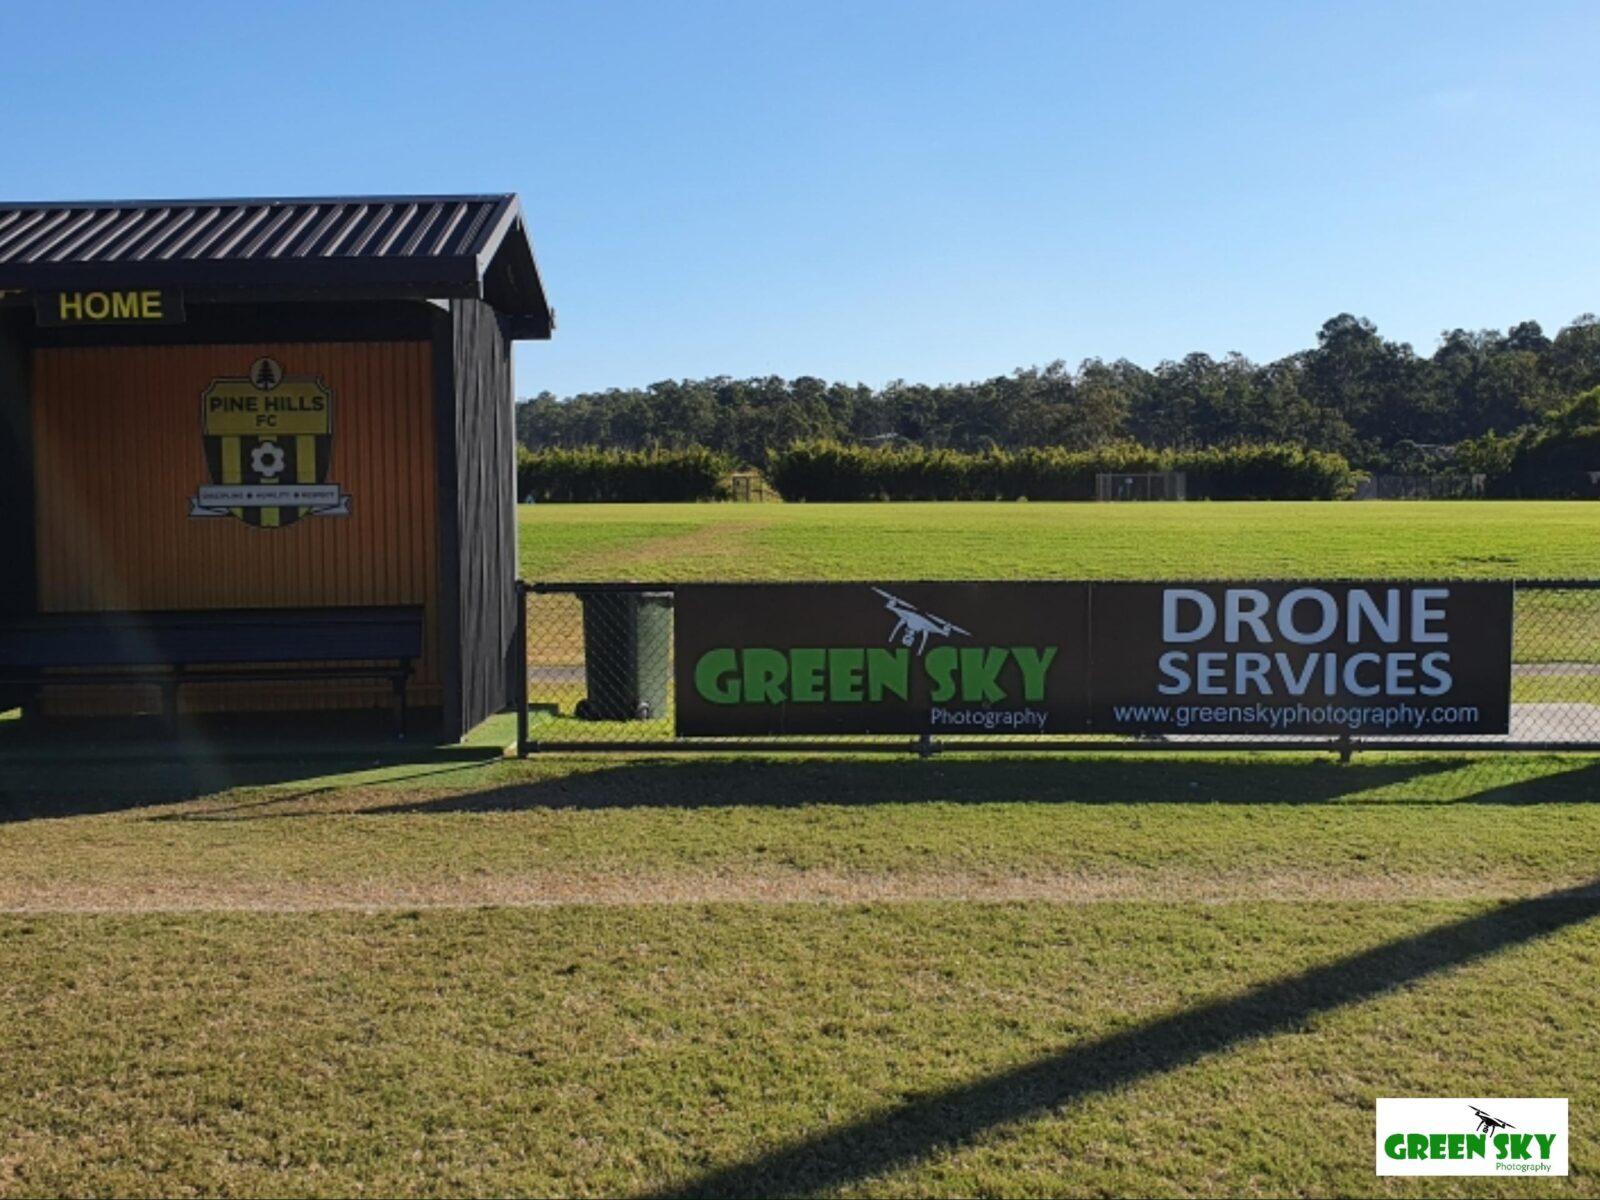 Drone Inspection Services Brisbane Melbourne Sydney